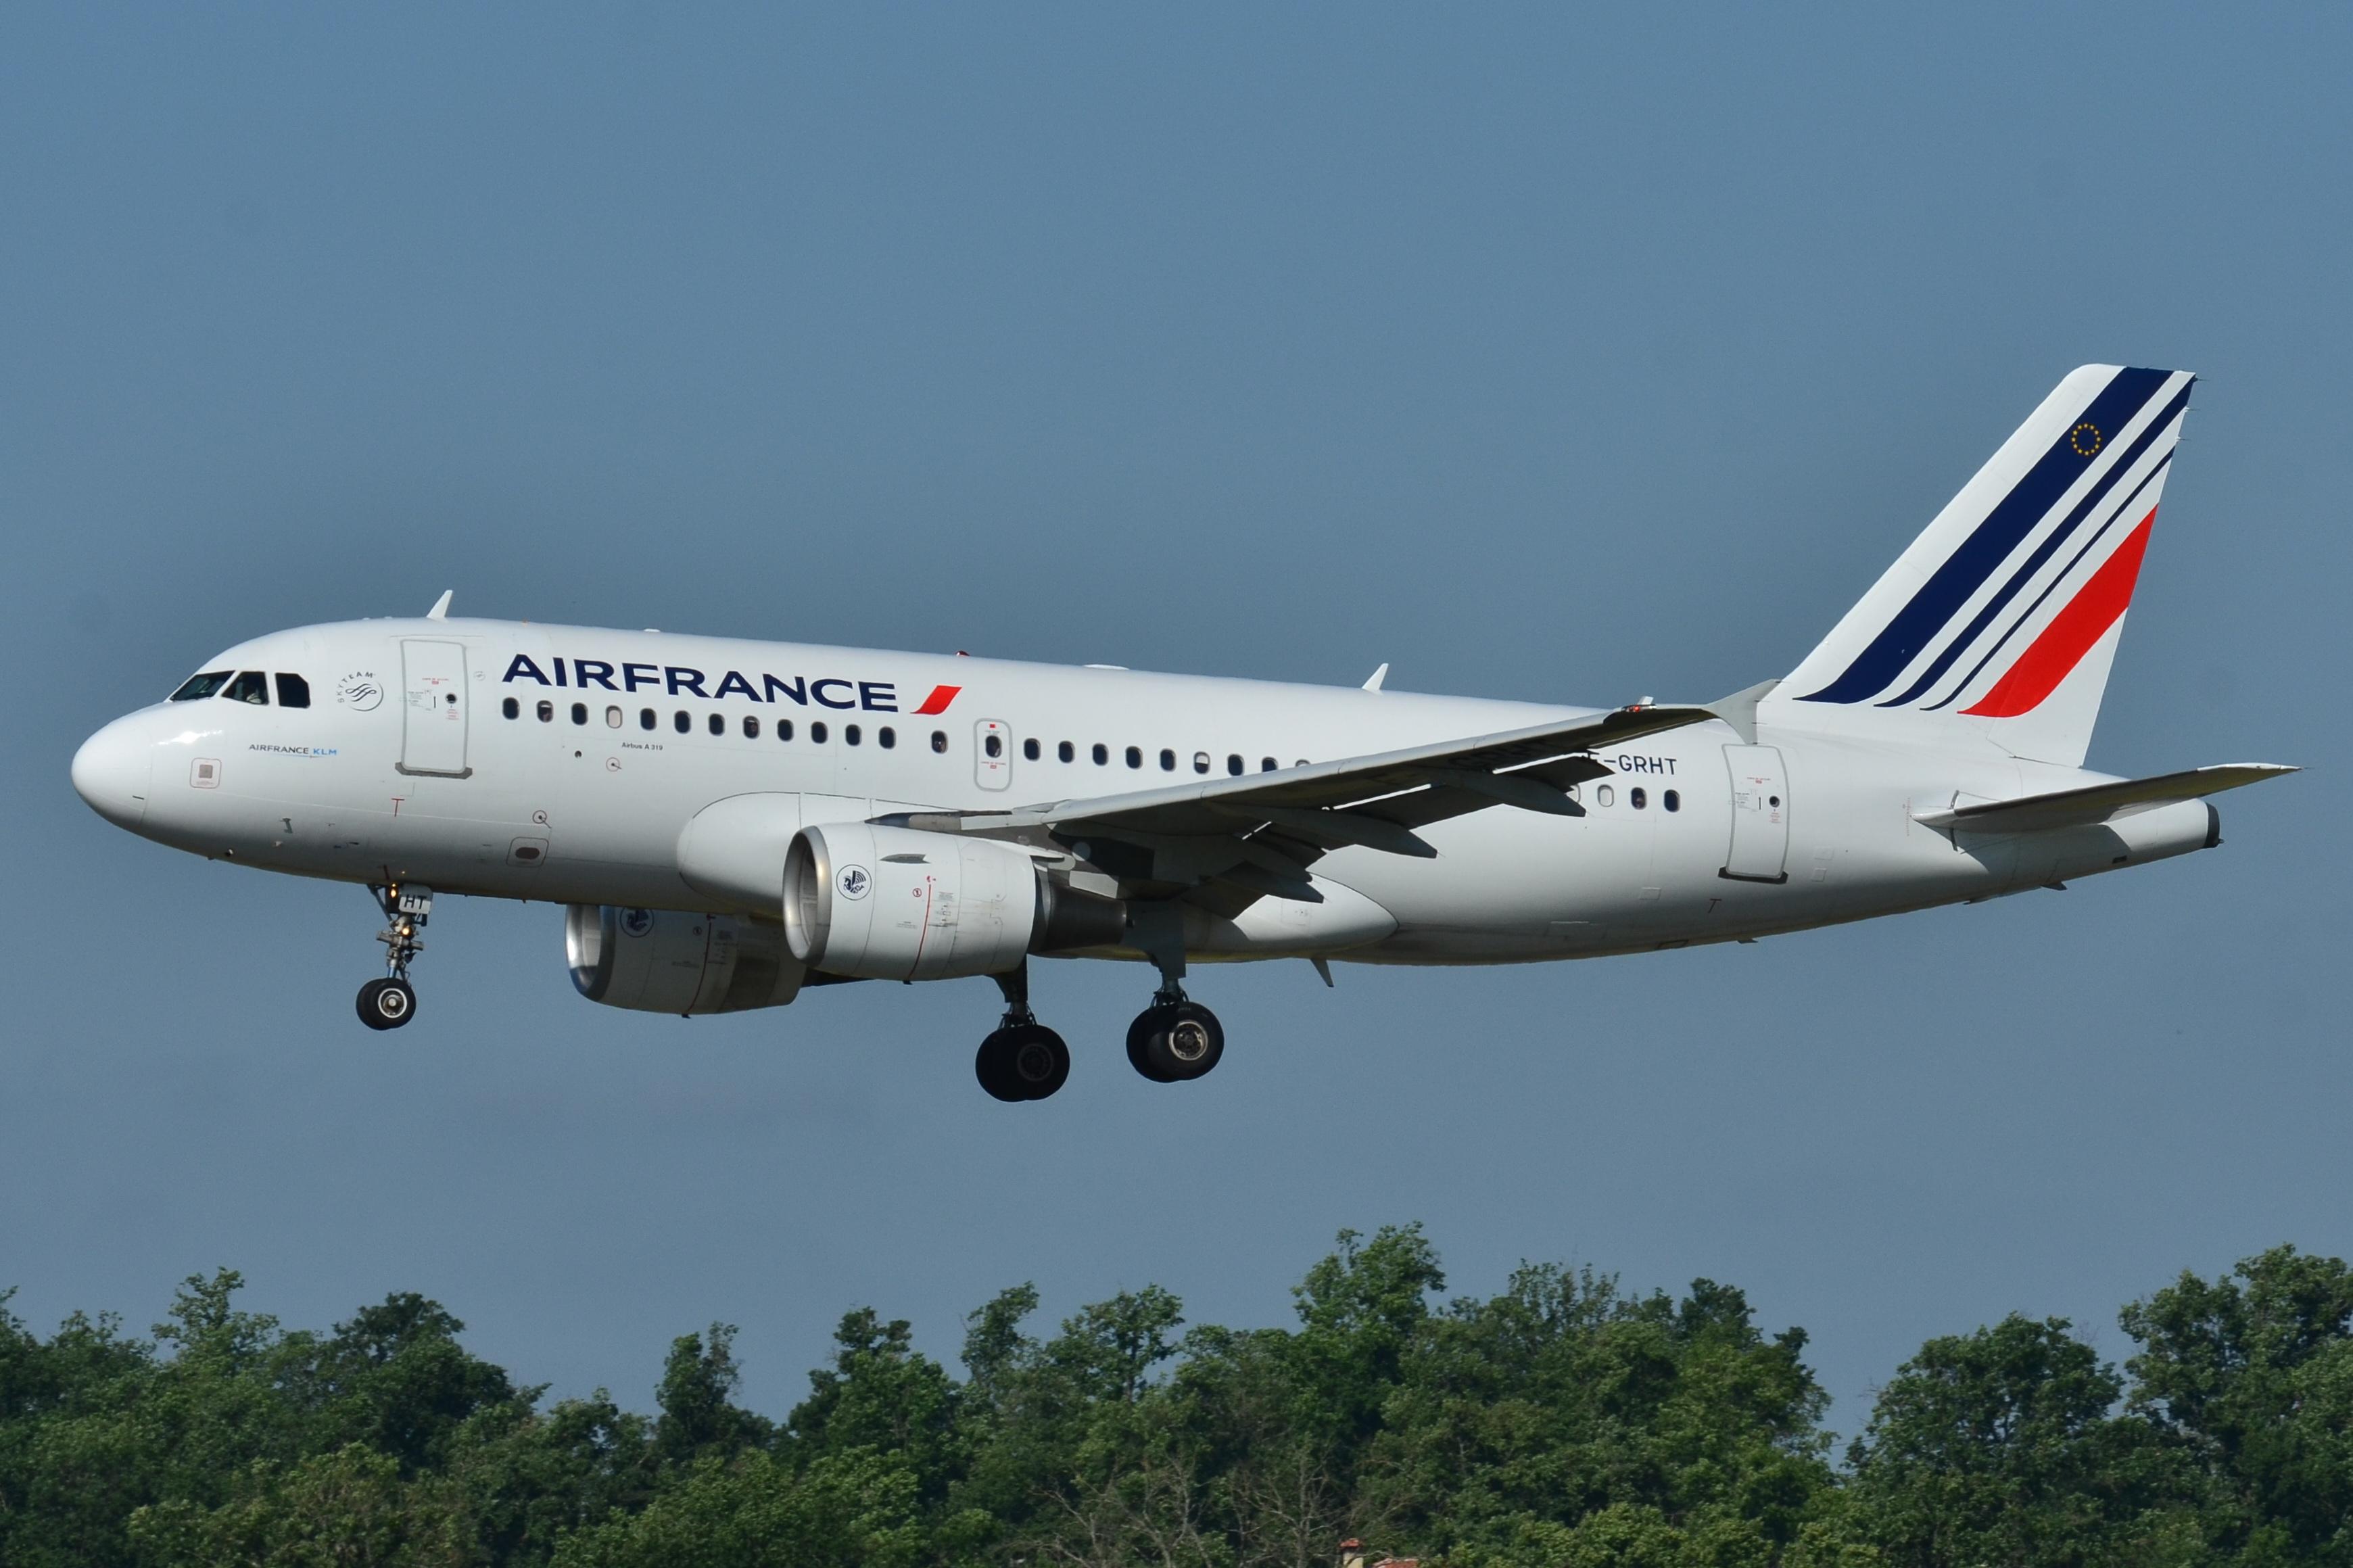 En Airbus A319-100 fra Air France. Foto: Laurent Errera